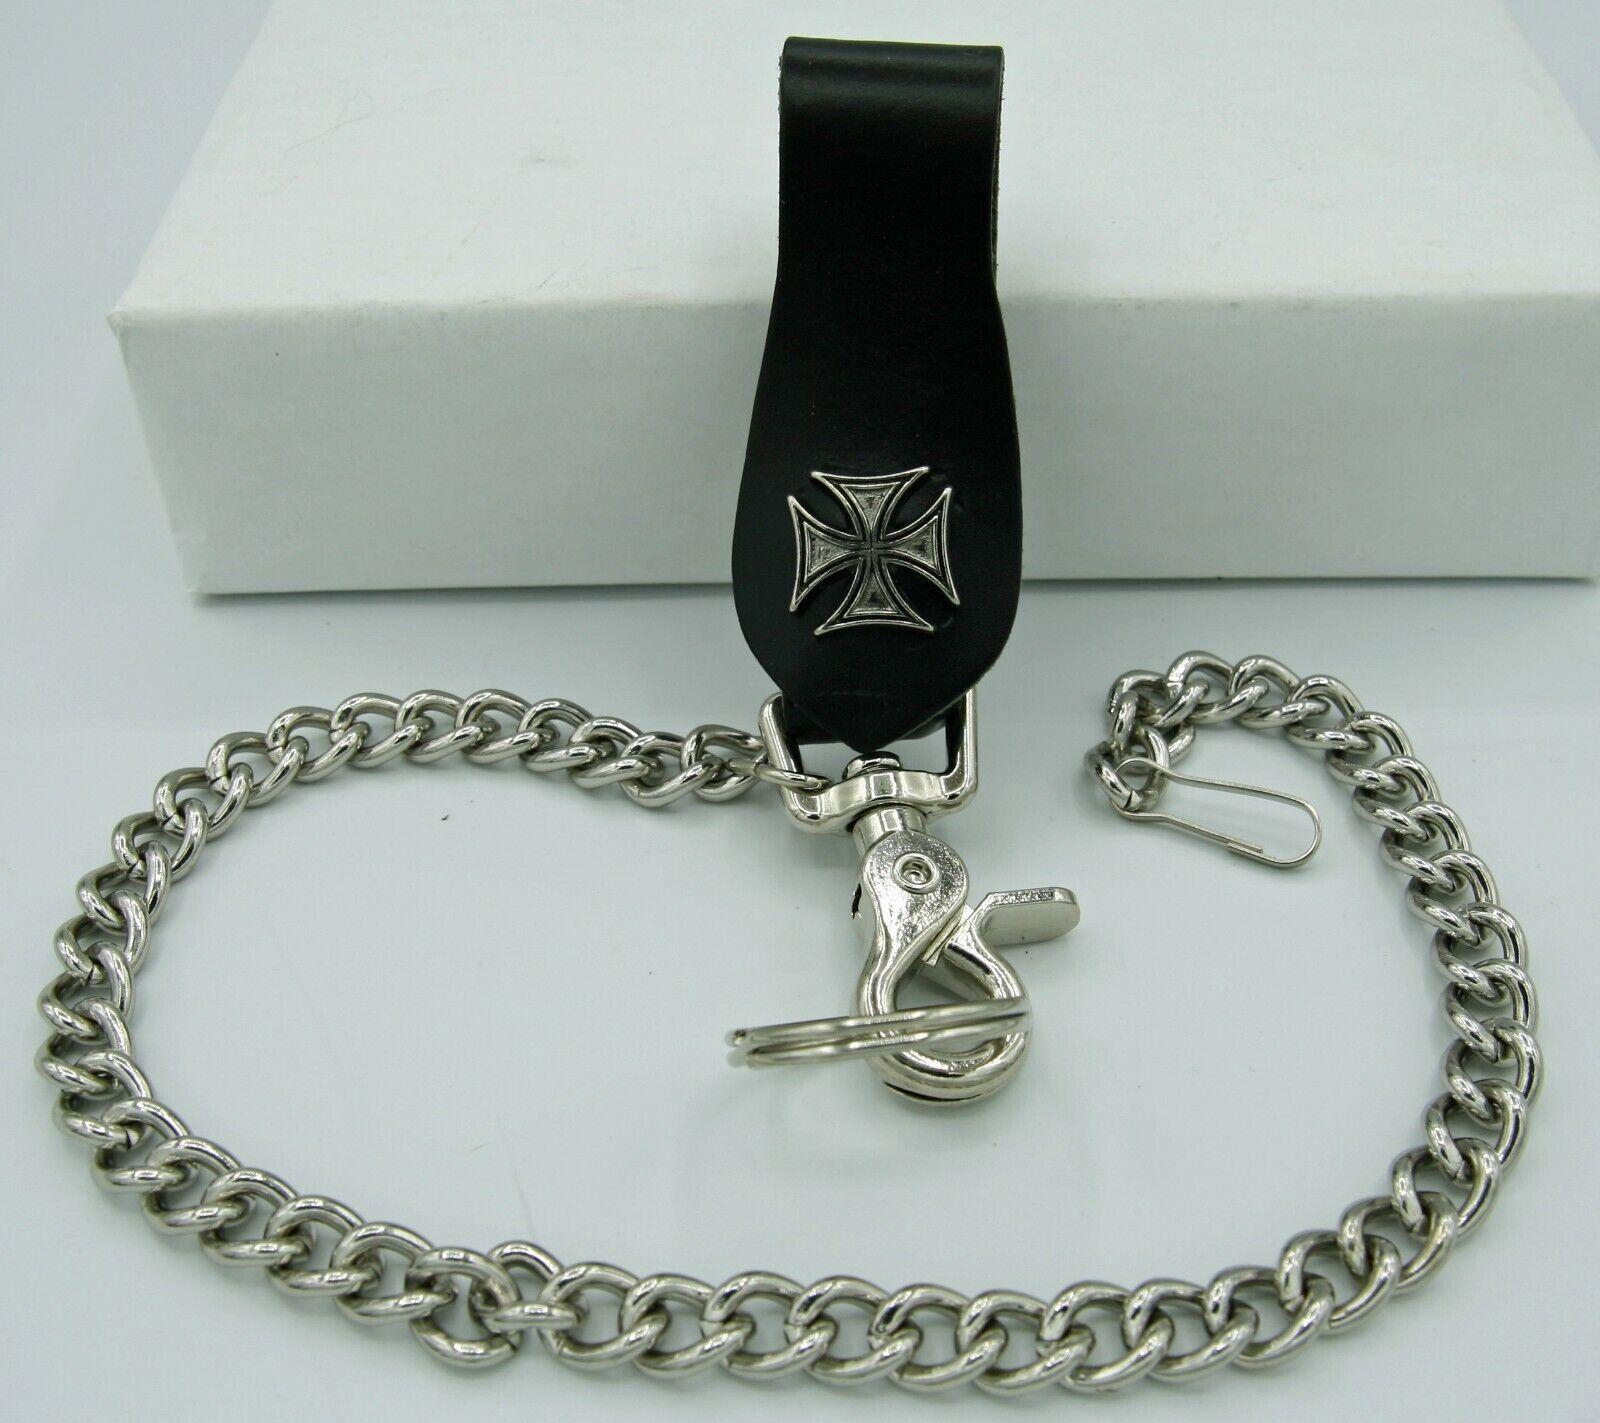 Wallet Chain Key Fob Ring Biker Trucker Replacement Iron Cross K18IC